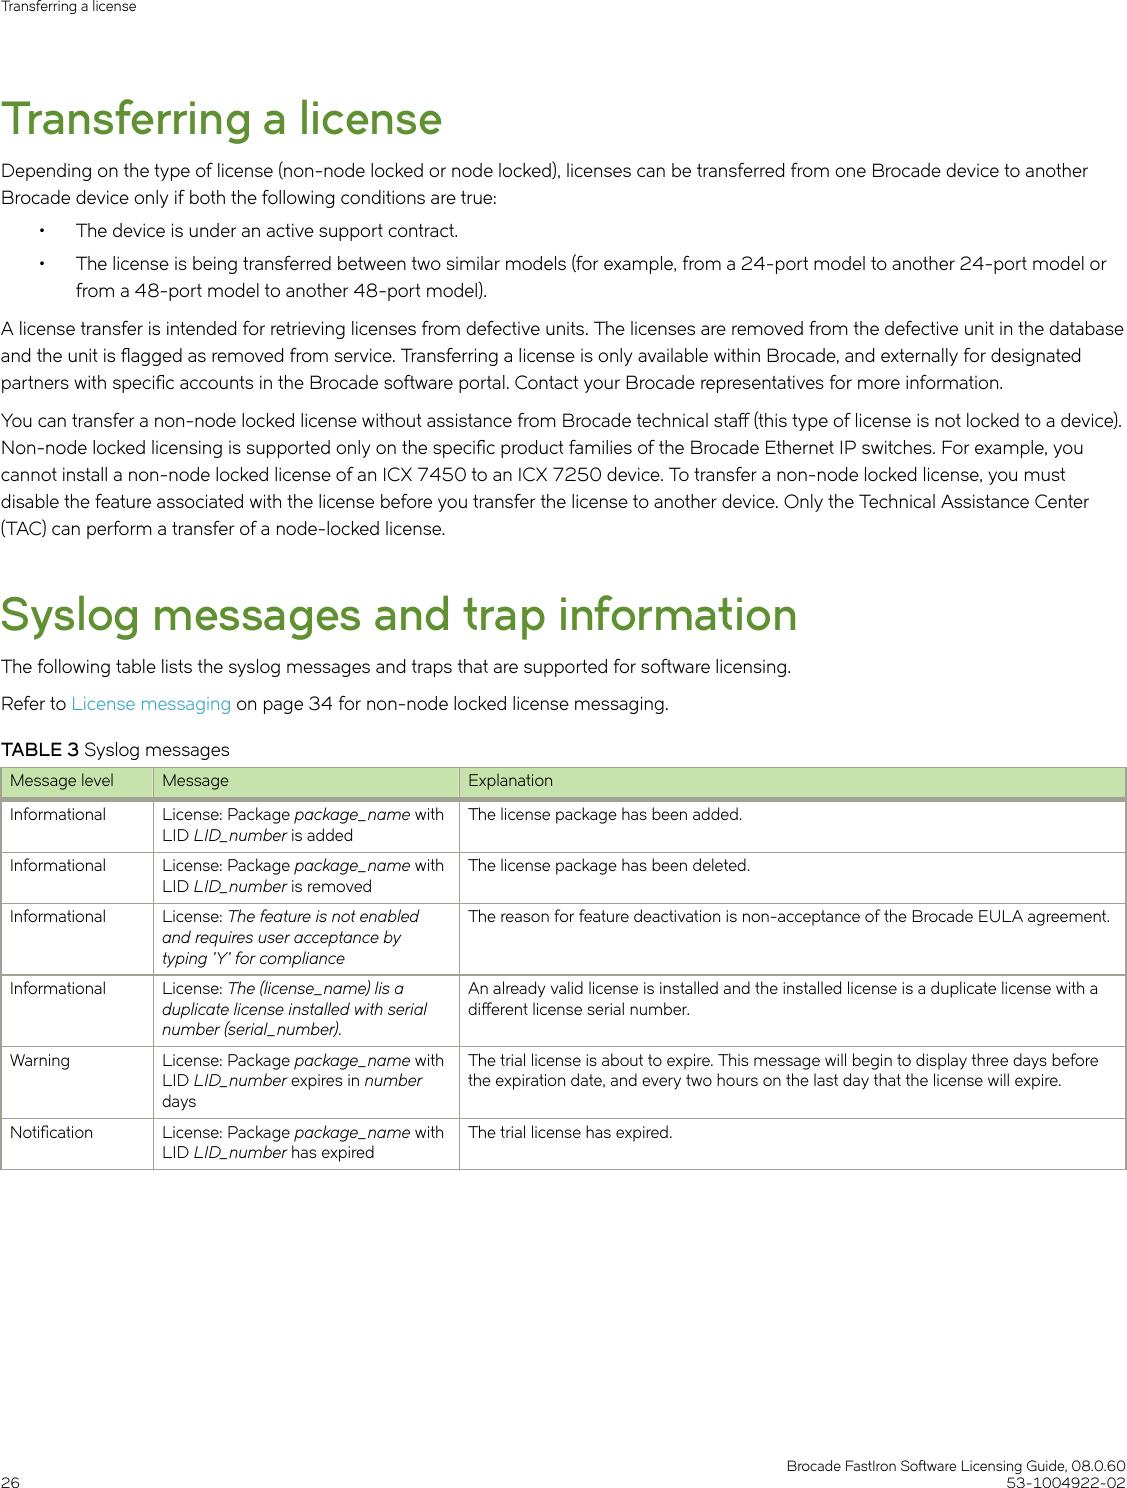 Ruckus Brocade FastIron Software Licensing Guide, 08 0 60